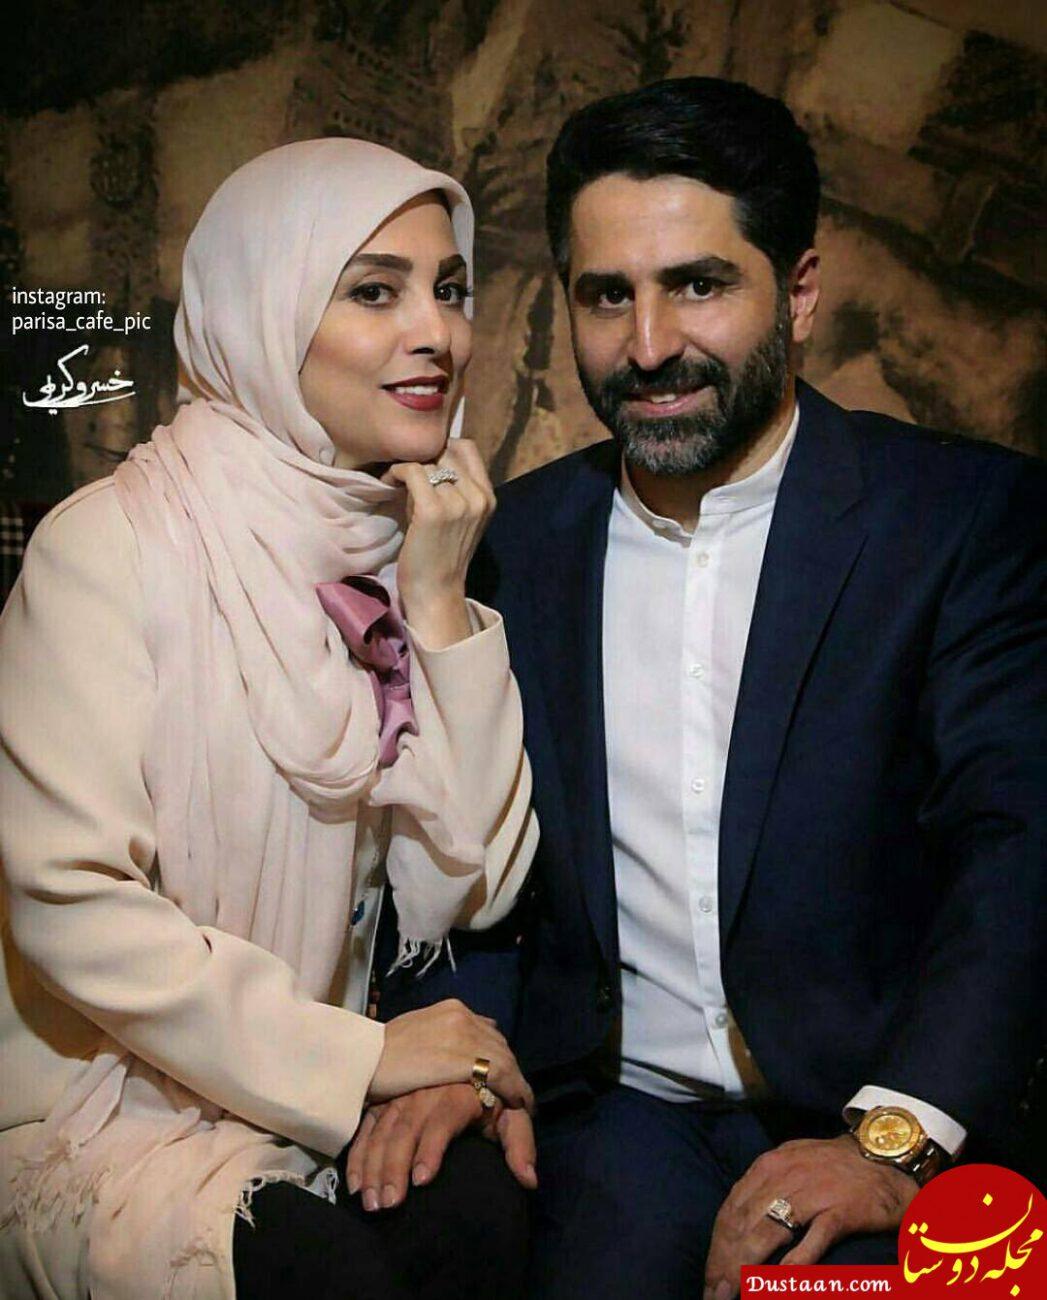 www.dustaan.com بیوگرافی و عکس های جذاب ژیلا صادقی و همسرش محسن رجبی